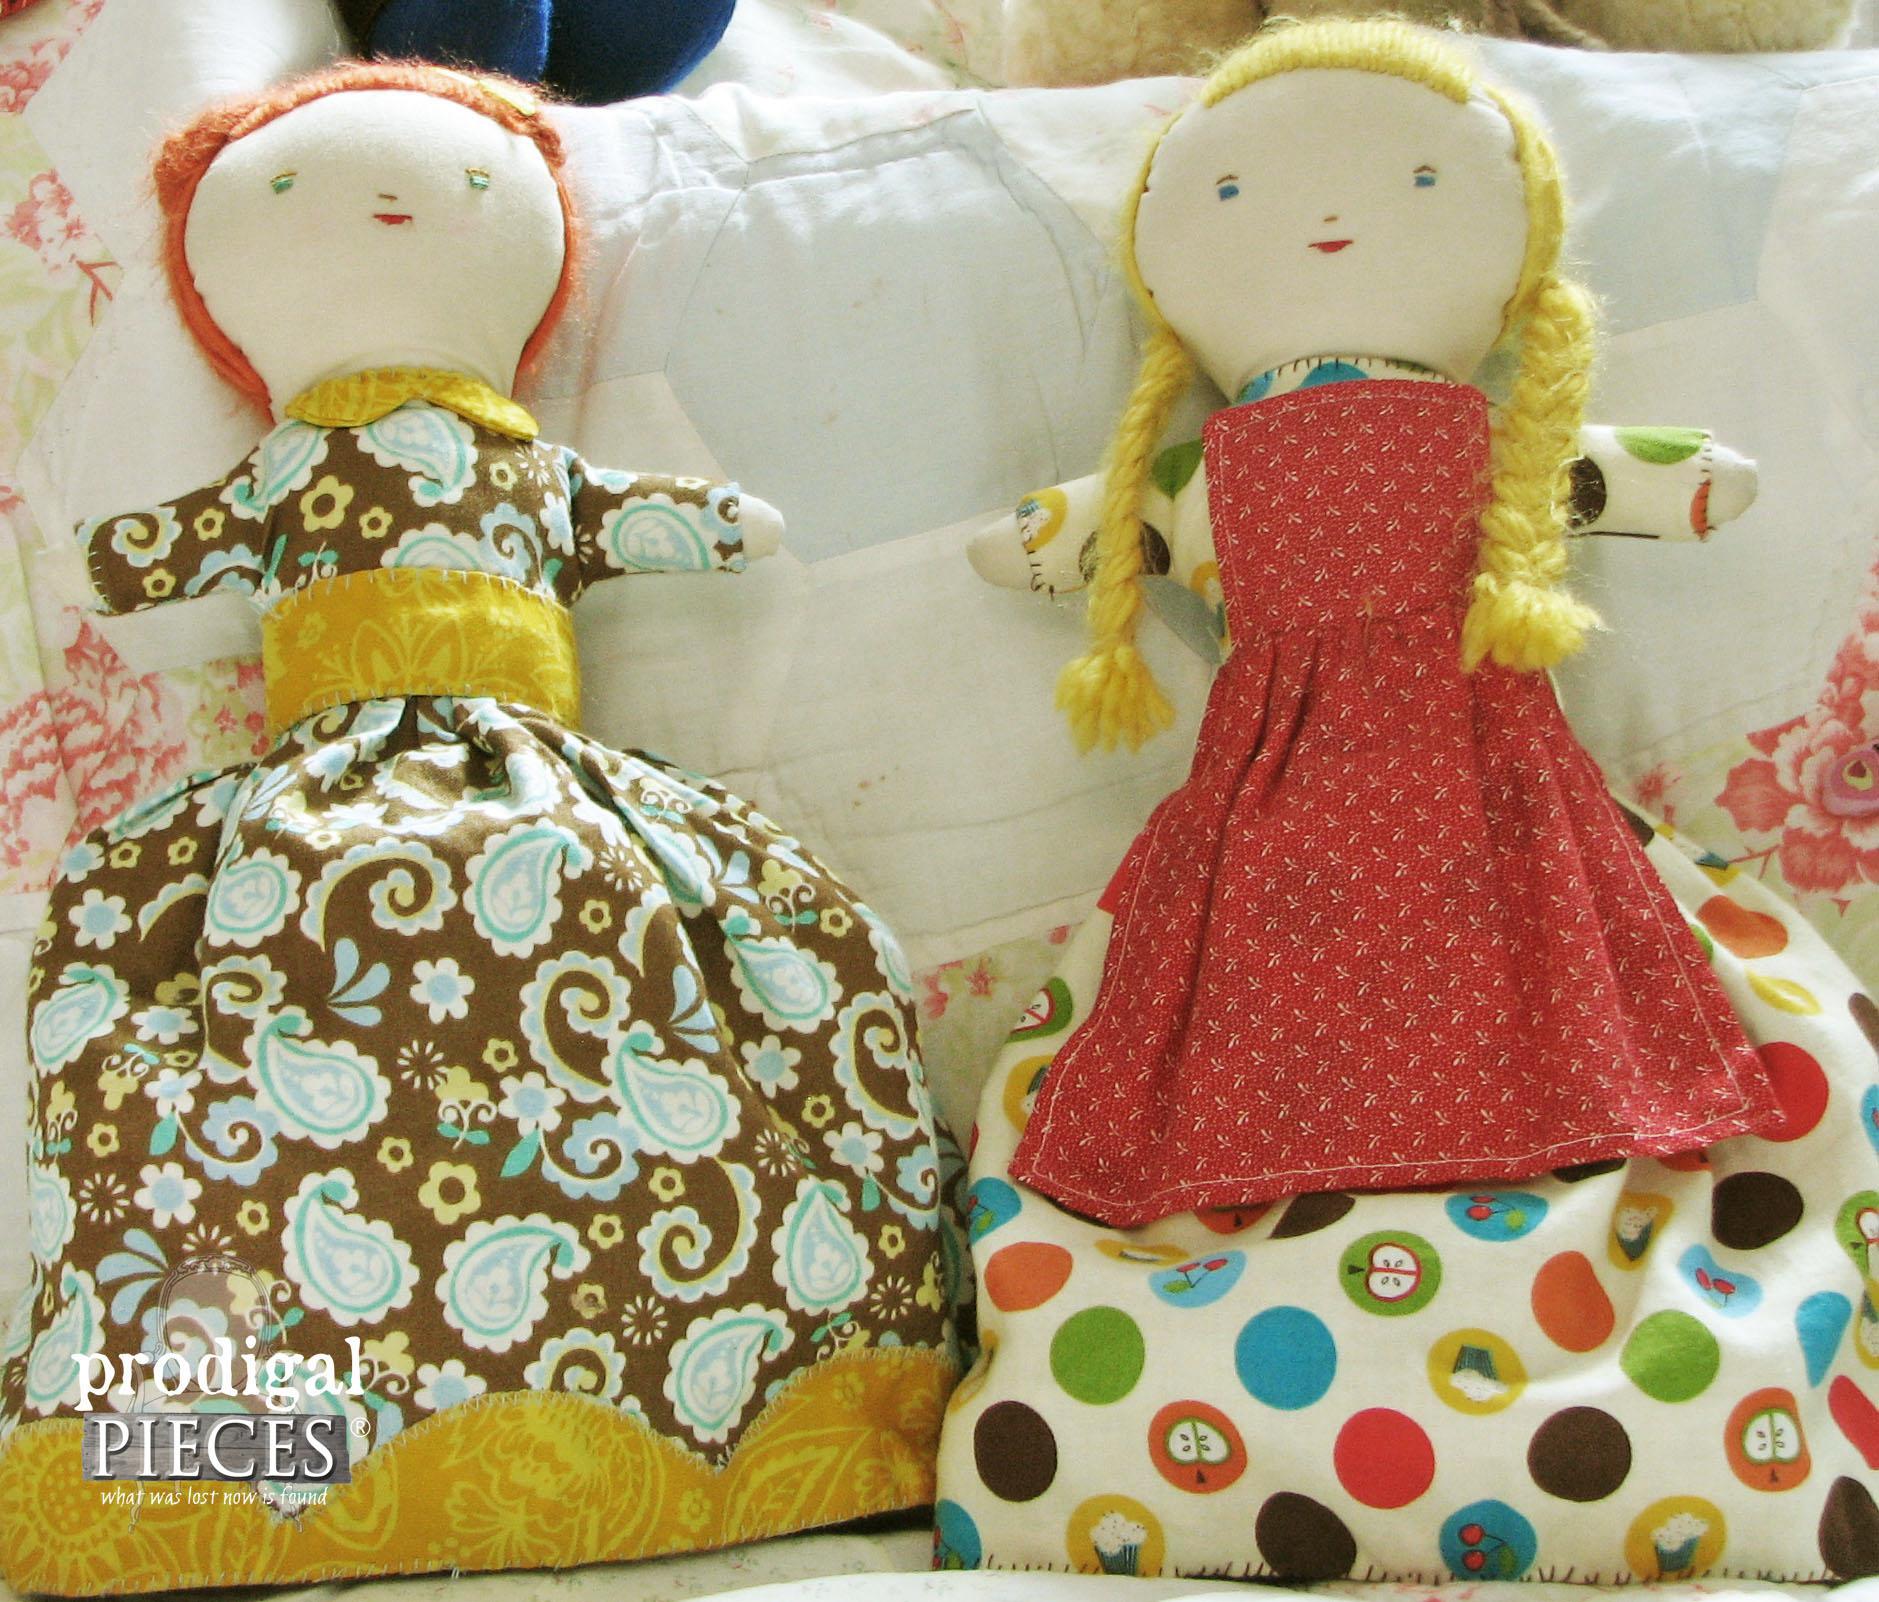 Reverse Handmade Topsy Turvy Dolls by Prodigal Pieces | www.prodigalpieces.com